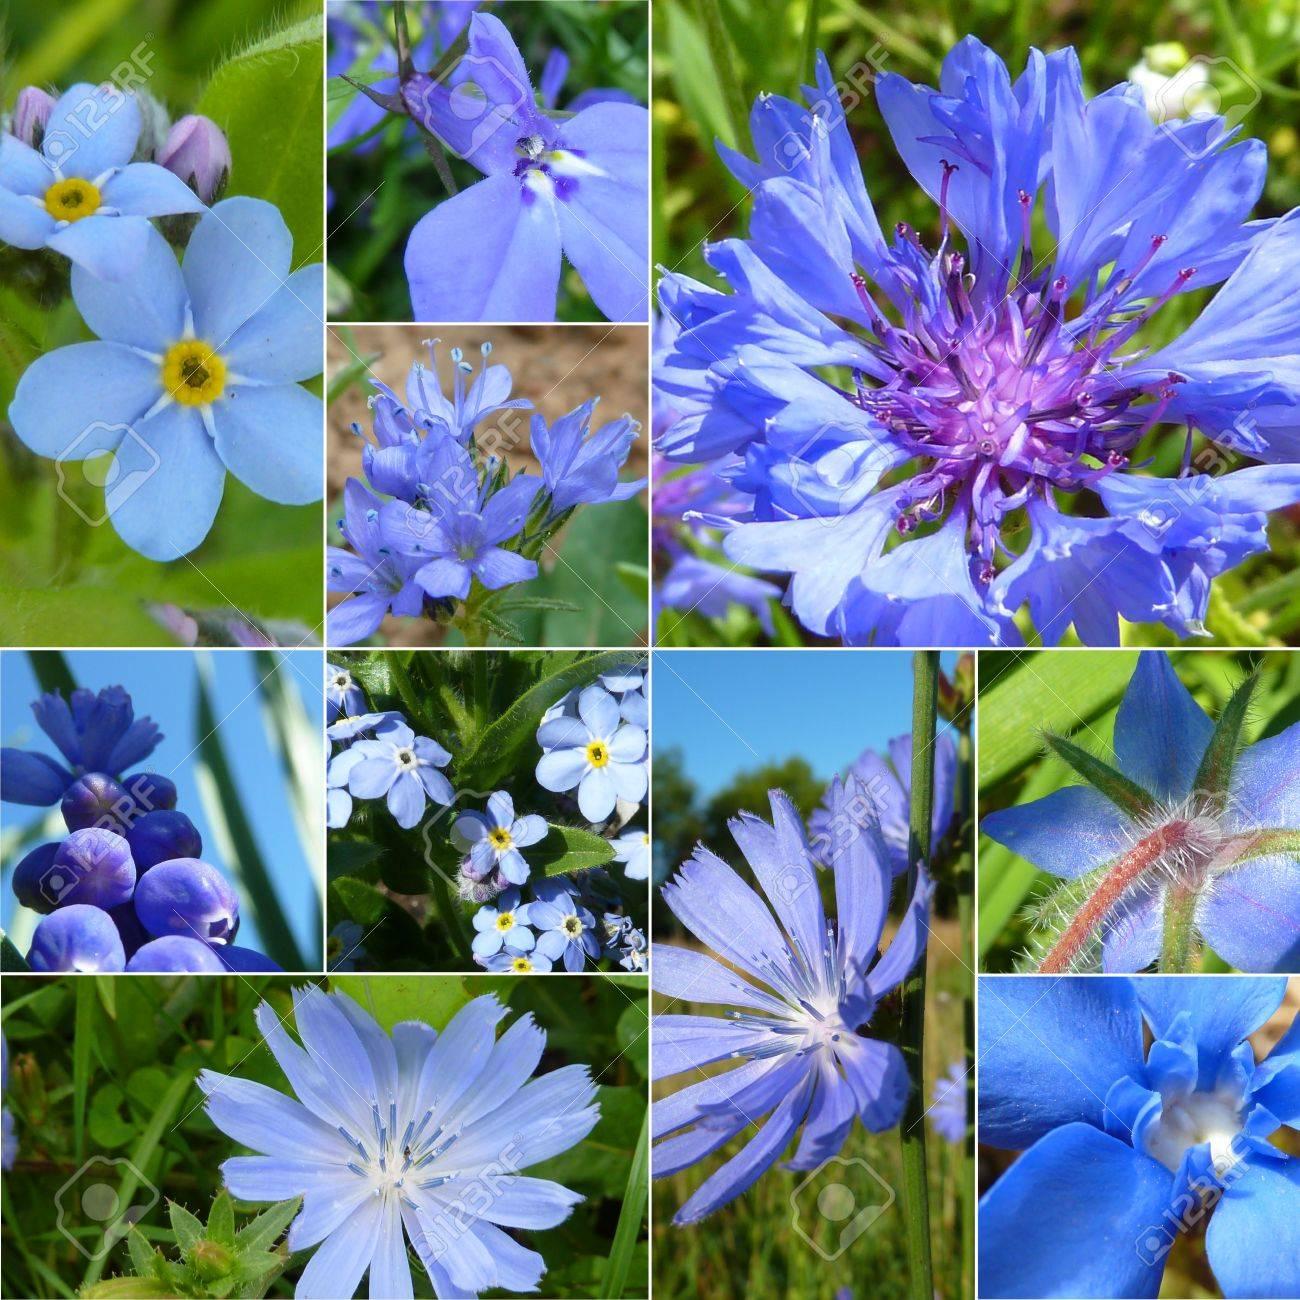 Beautiful blue flowers in germany stock photo picture and royalty beautiful blue flowers in germany stock photo 11322777 izmirmasajfo